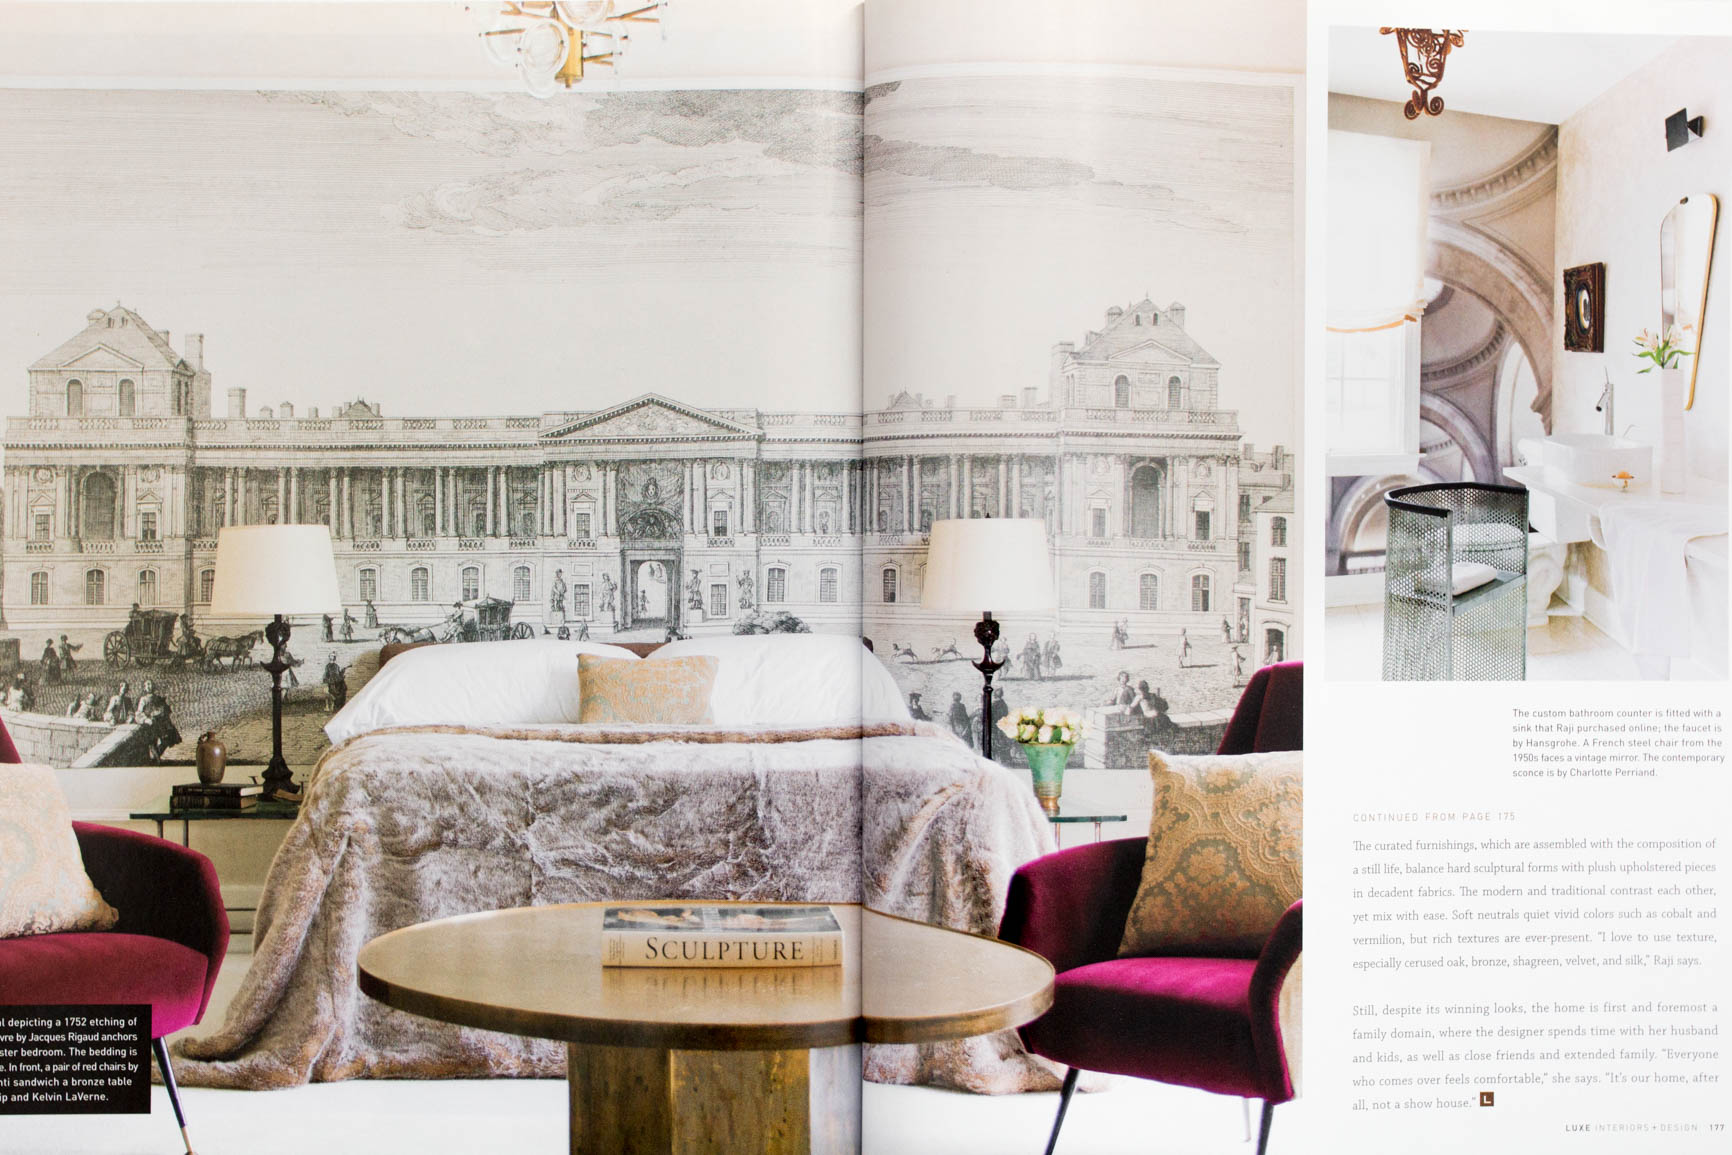 luxe-magazine-bedroom-dc-interior-design.jpg